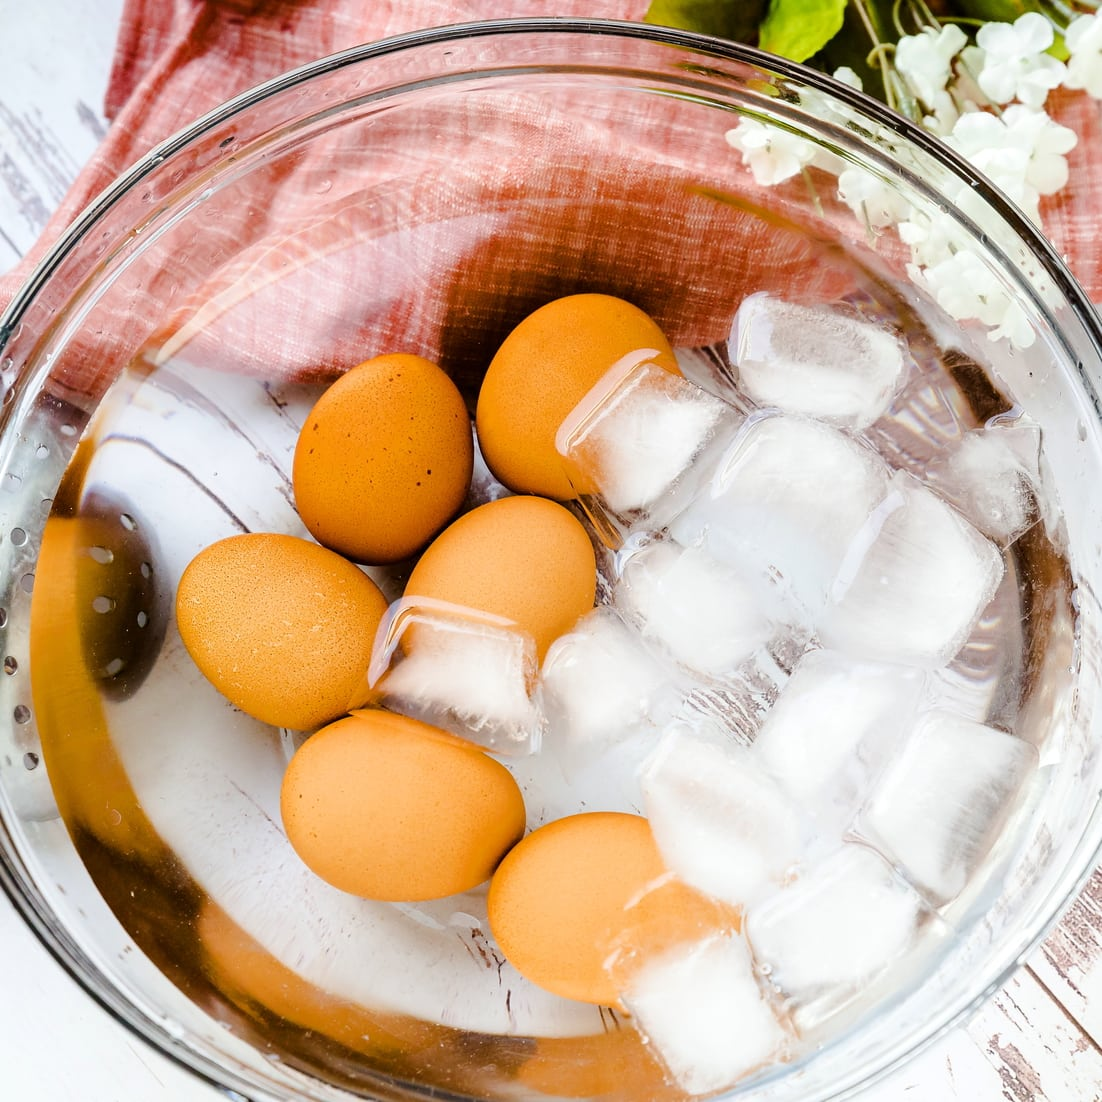 soft boiled eggs in an ice bath